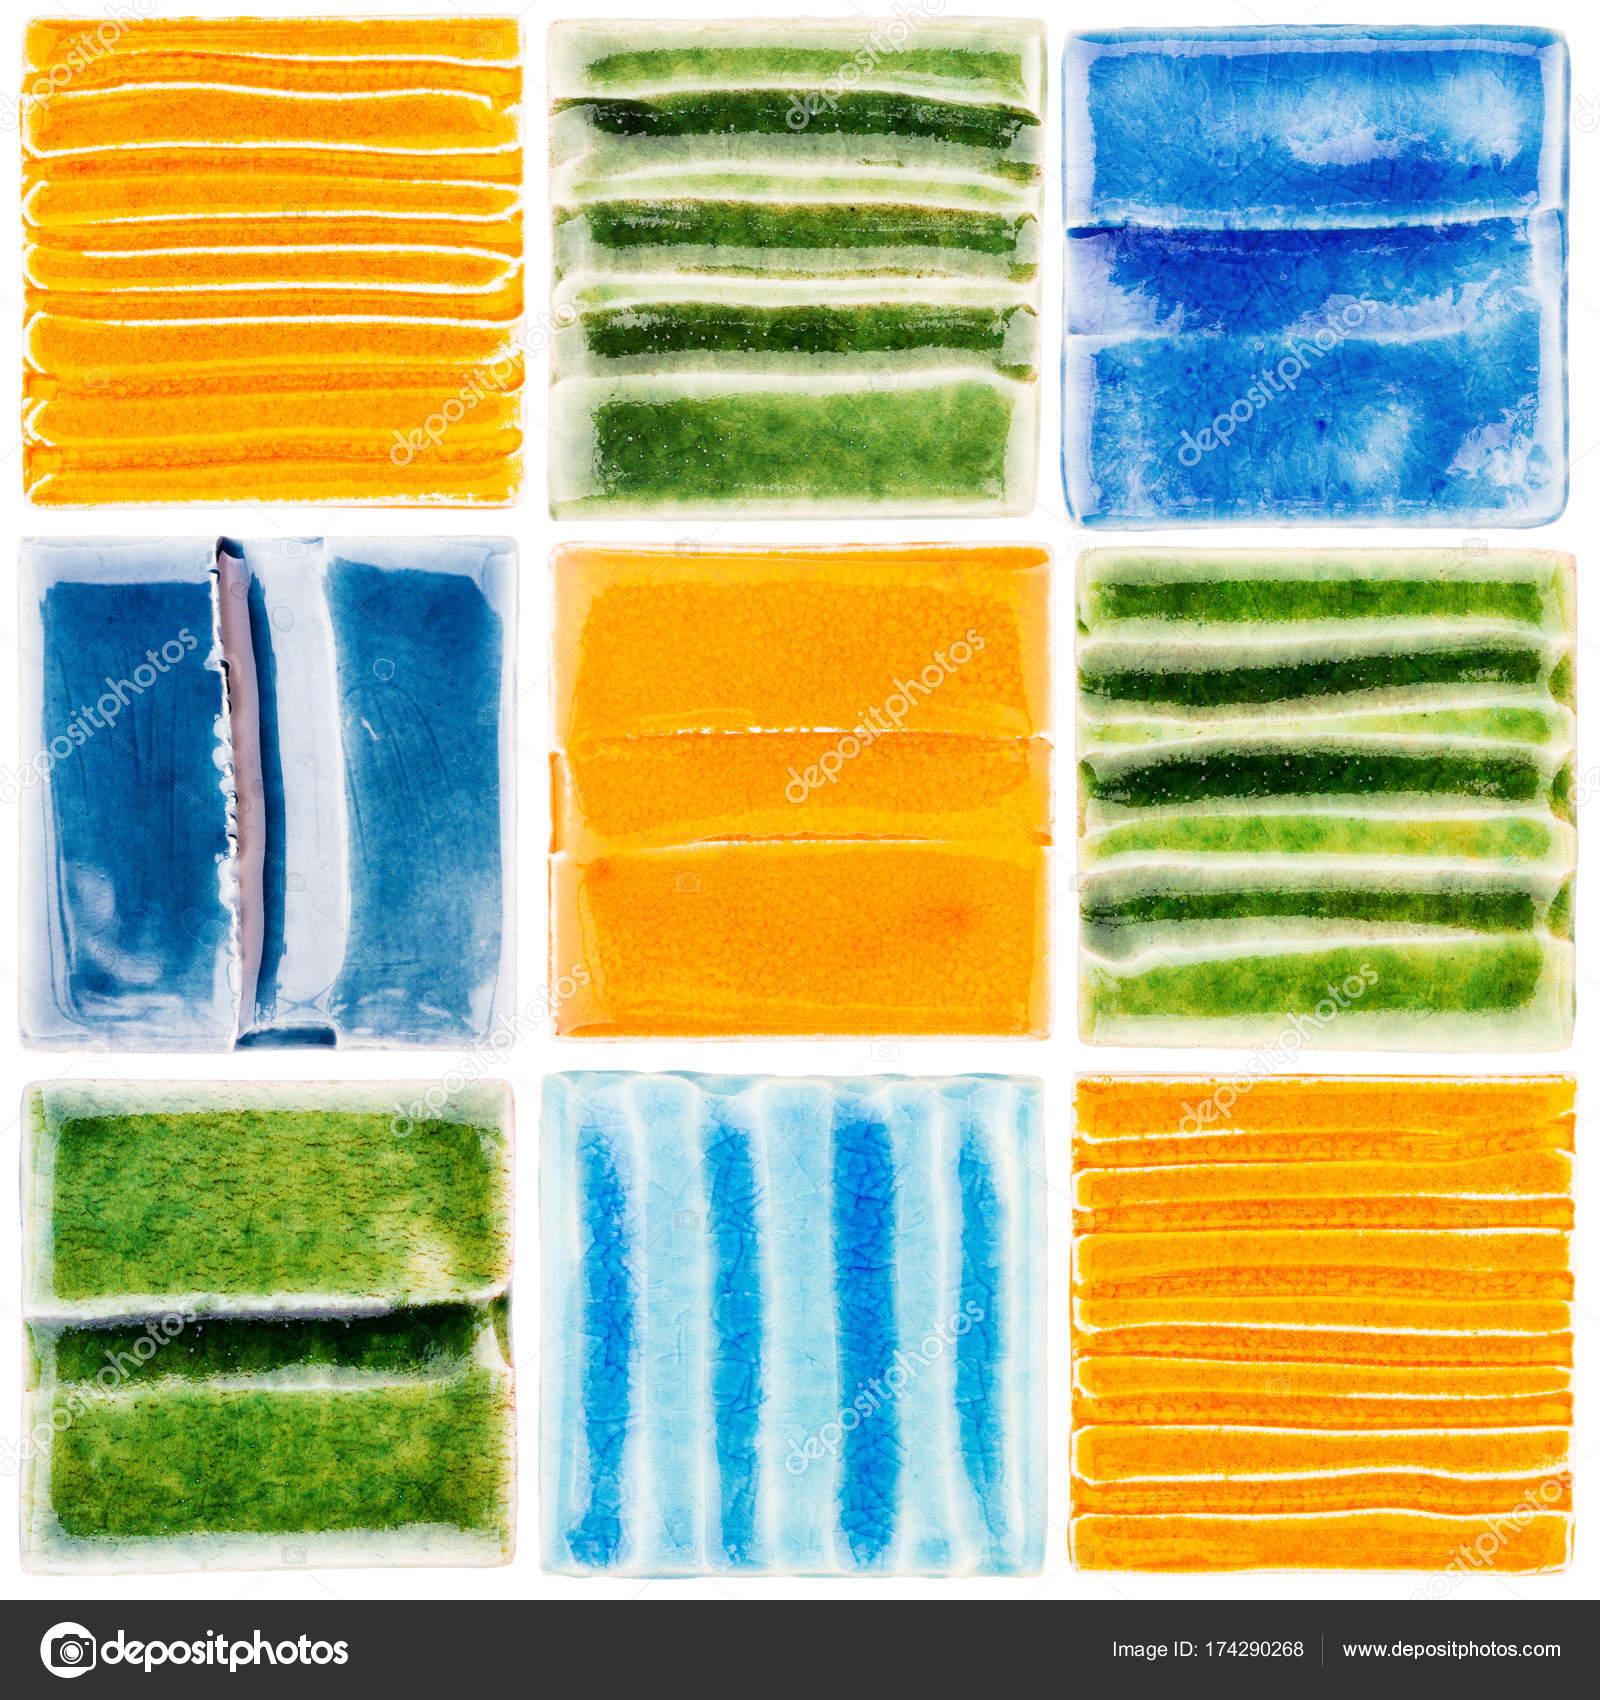 Collection of handmade glazed ceramic tiles stock photo taigi collection of handmade glazed ceramic tiles stock photo 174290268 dailygadgetfo Gallery